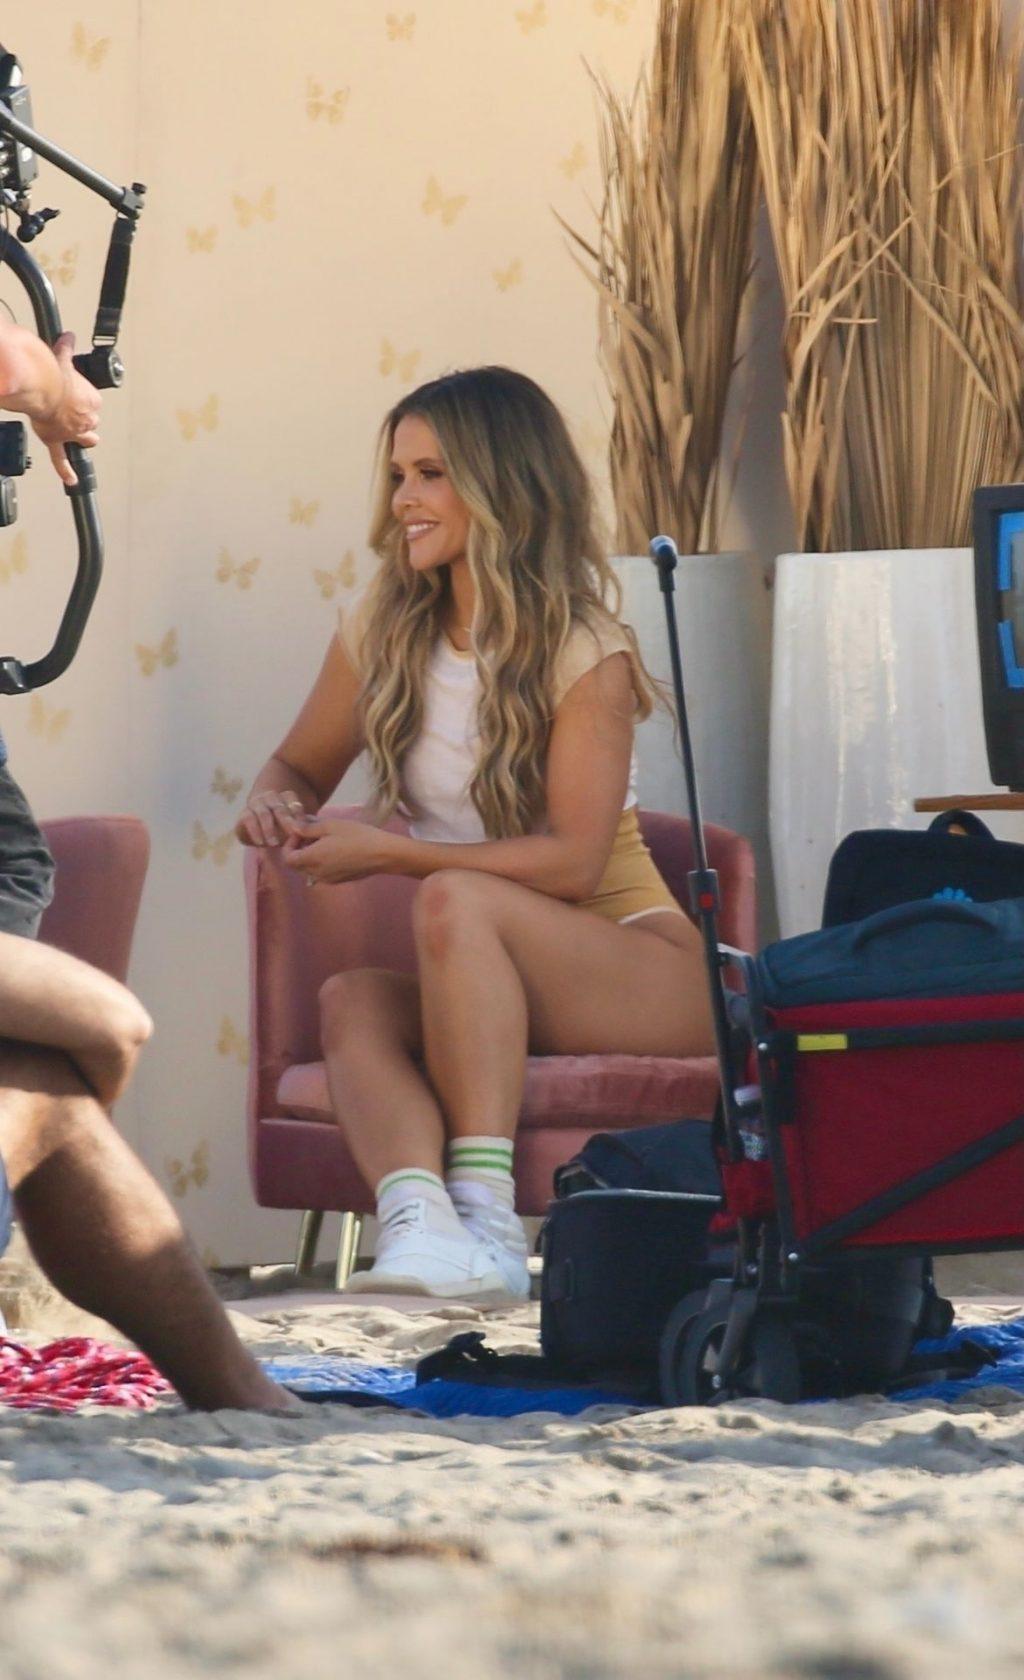 Katrina Hodgson is Spotted on a Photoshoot in LA (19 Photos)